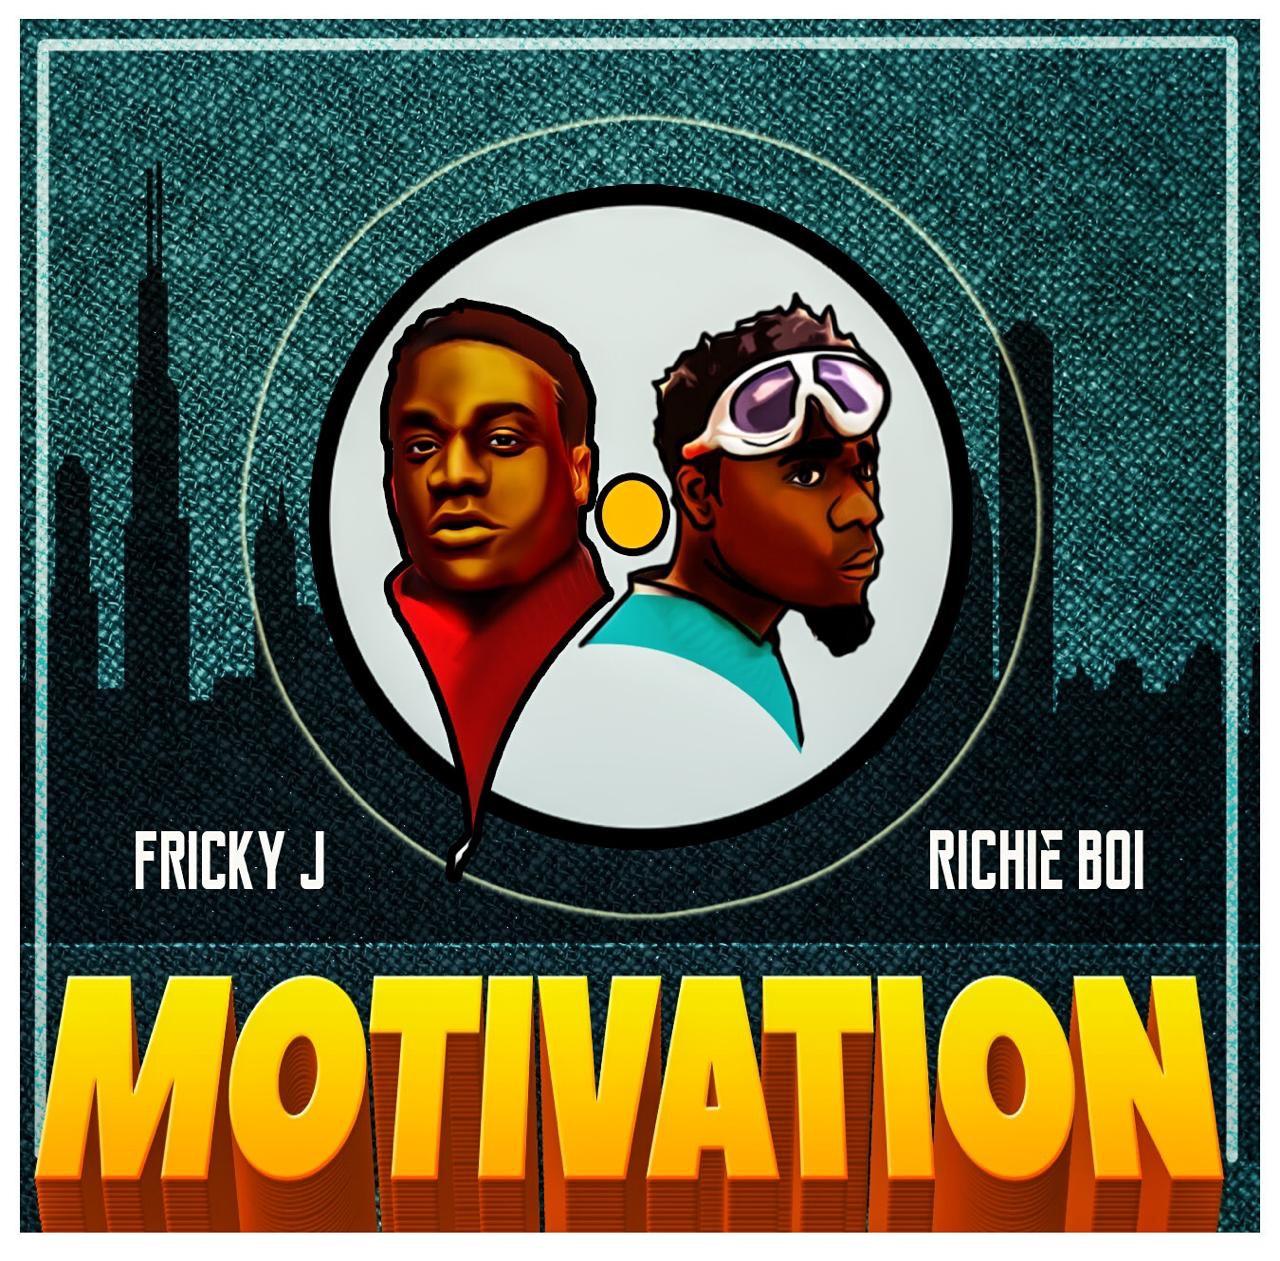 New Music: Fricky J feat. Richie Boi – Motivation